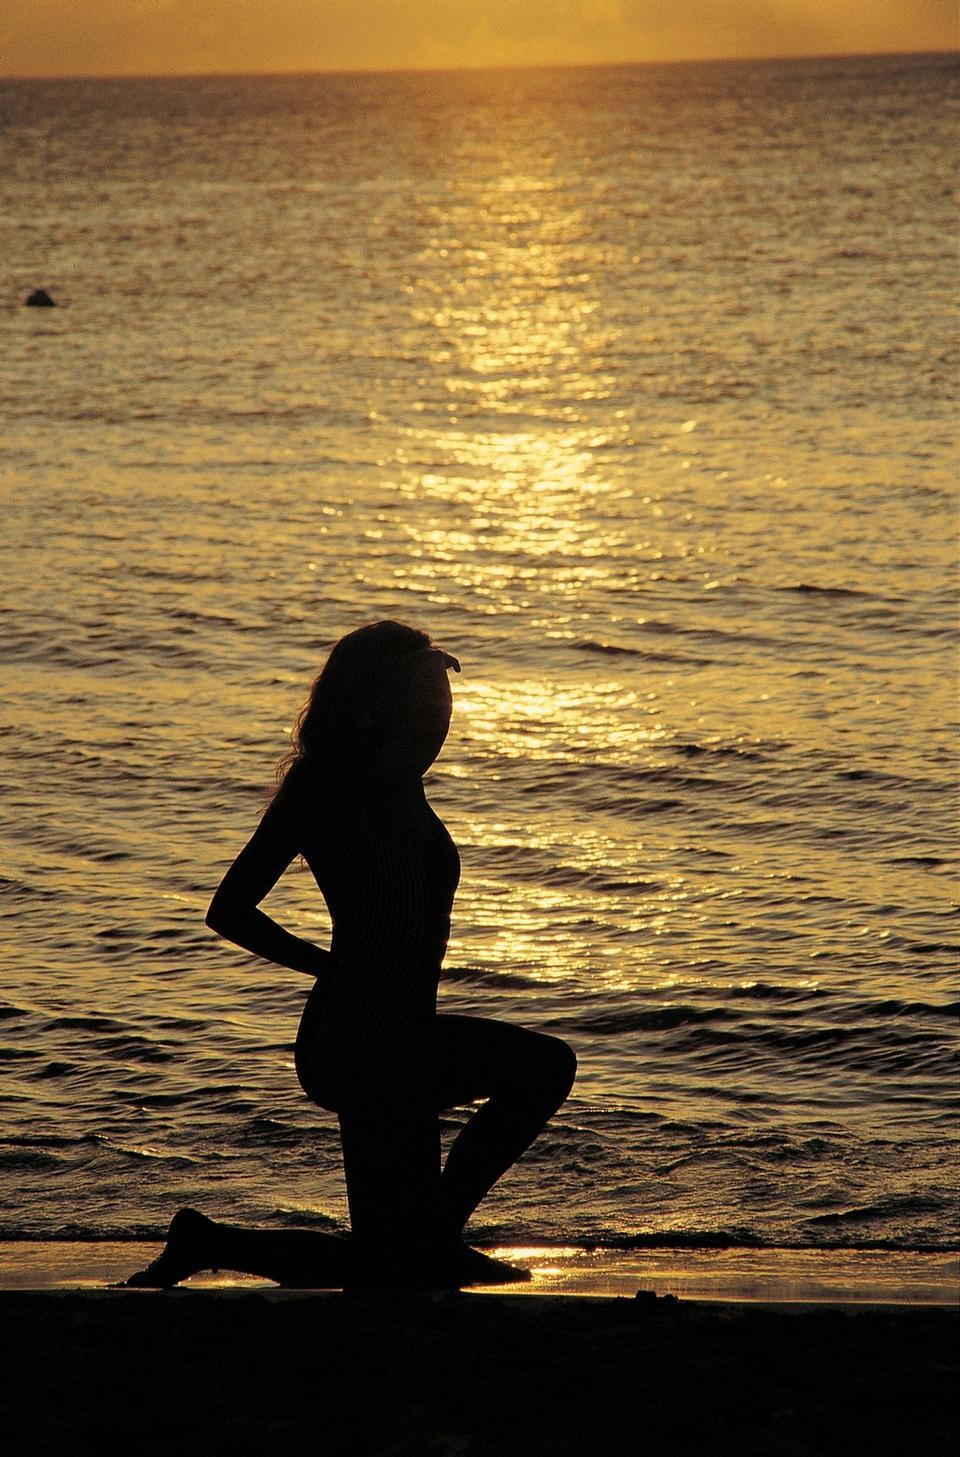 Schattenbild der Frau am Sonnenaufgang